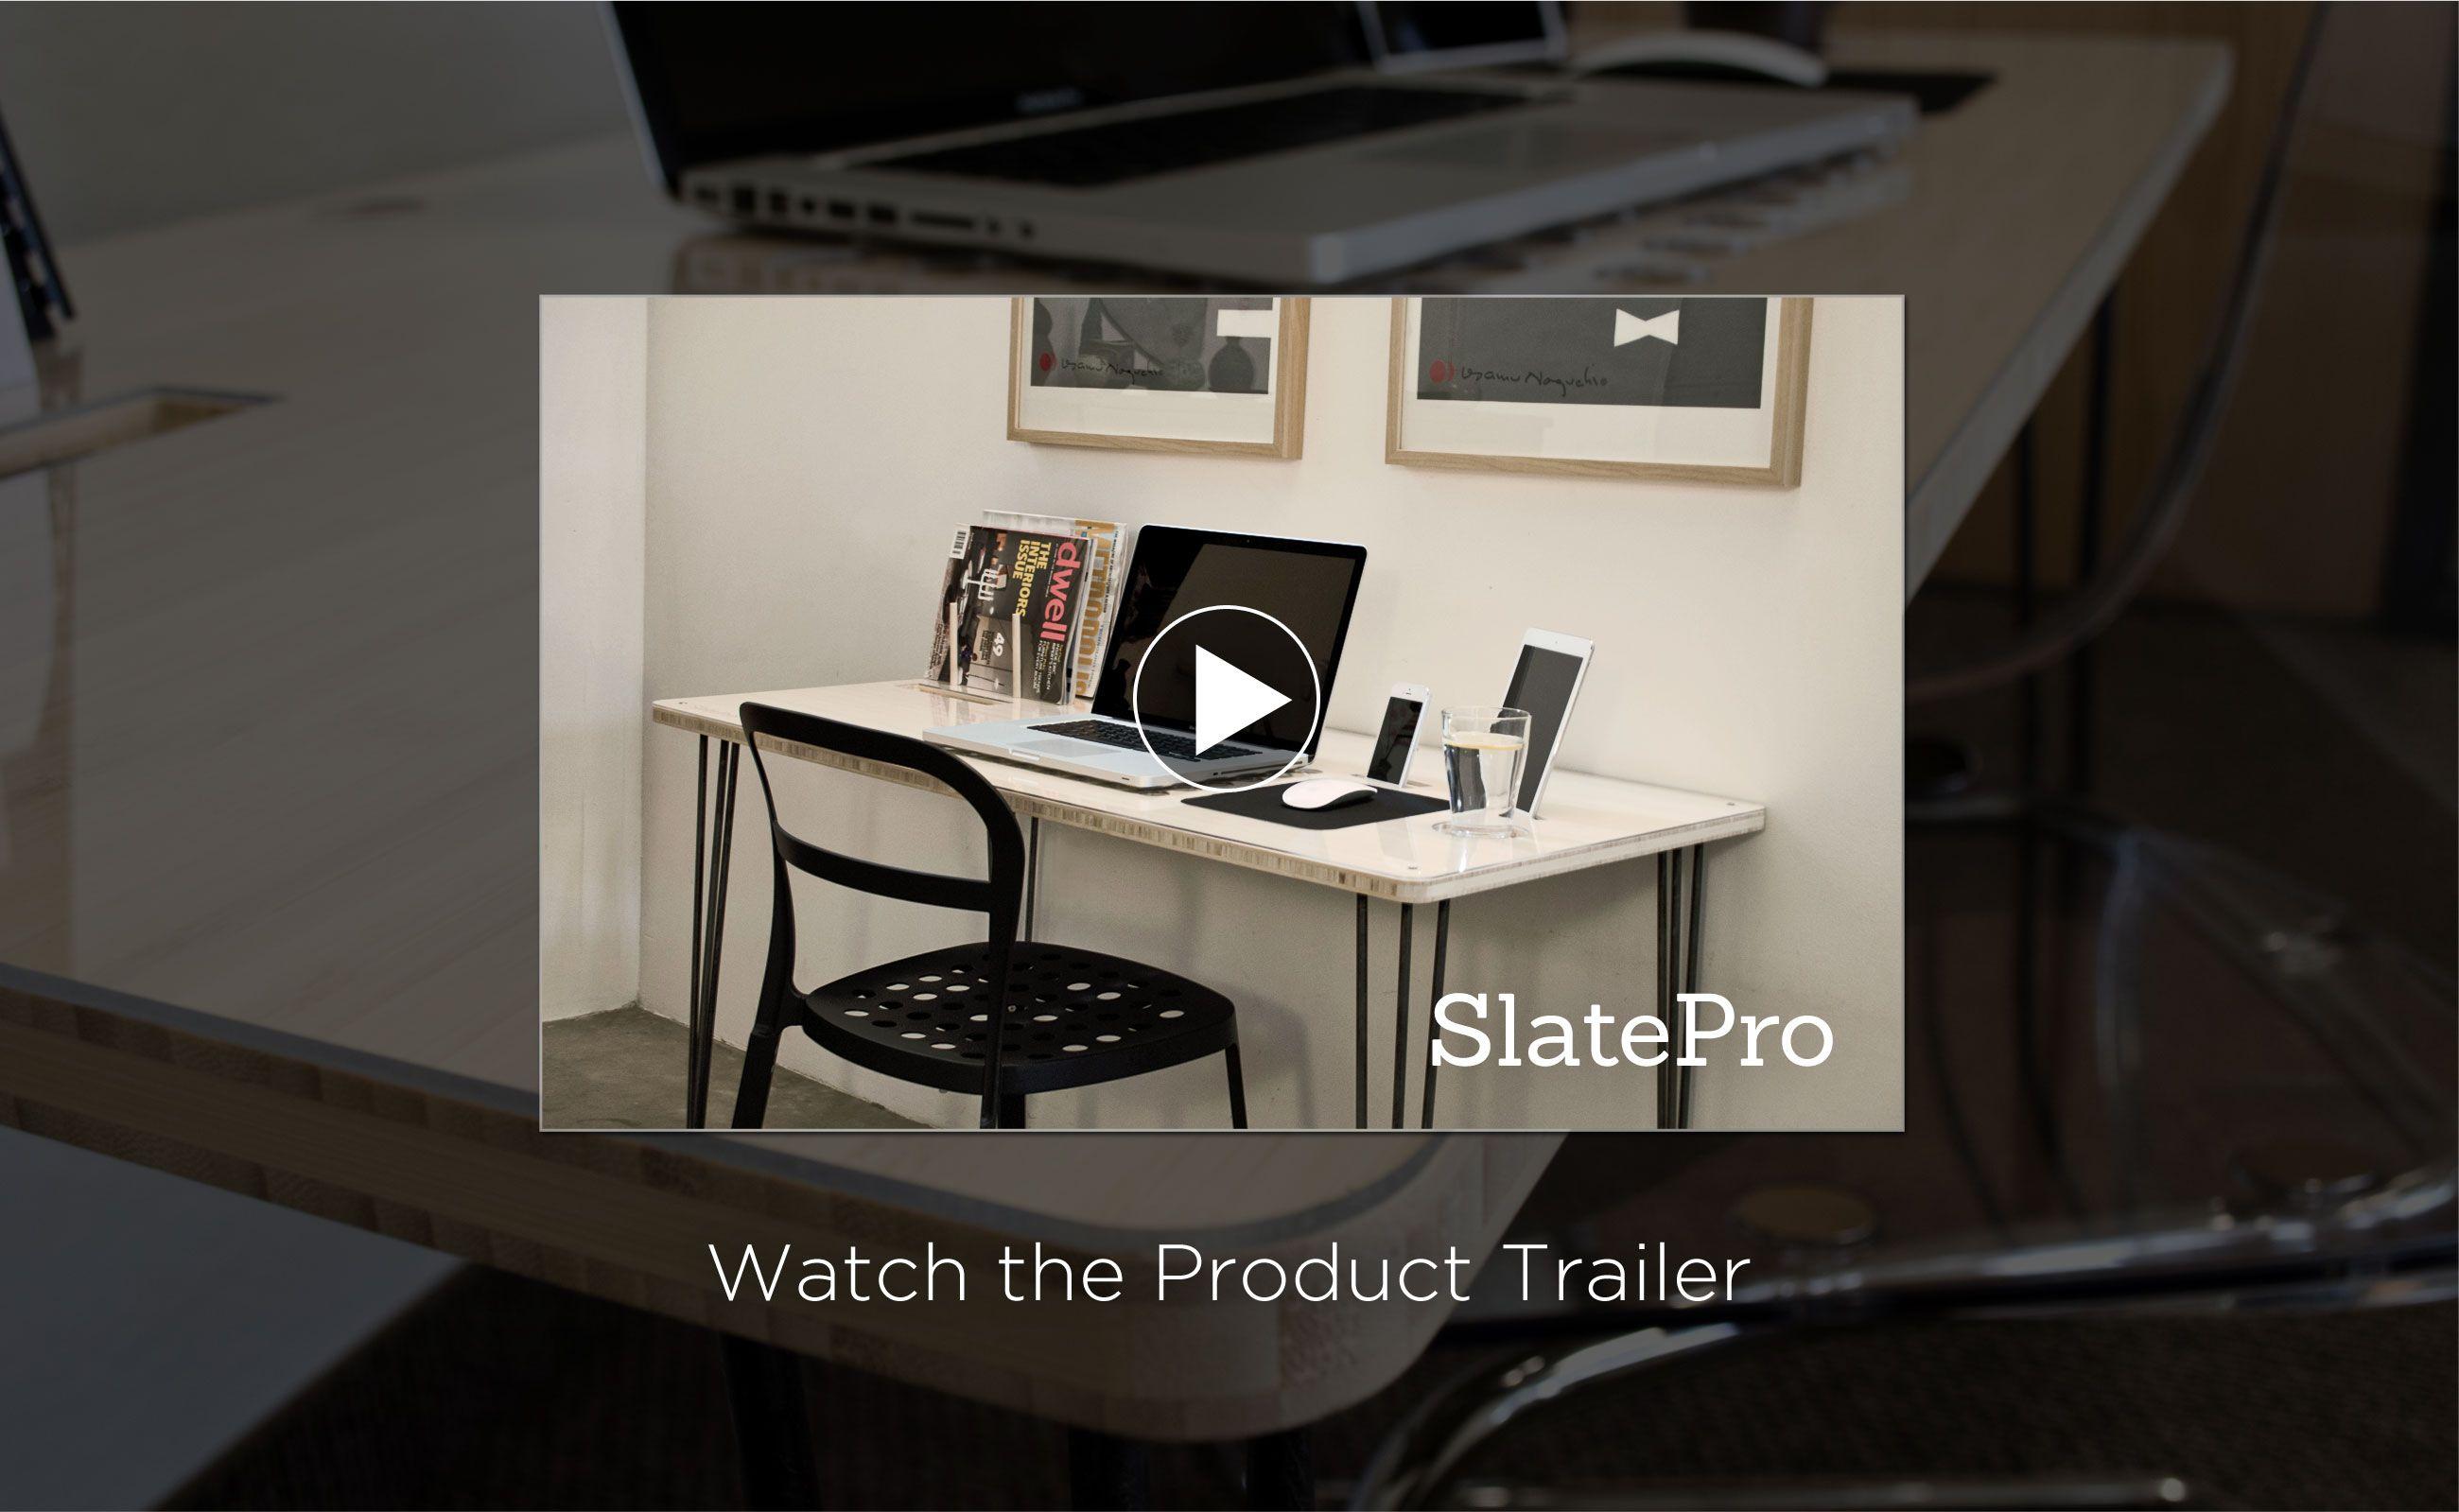 SlatePro - TechDesk